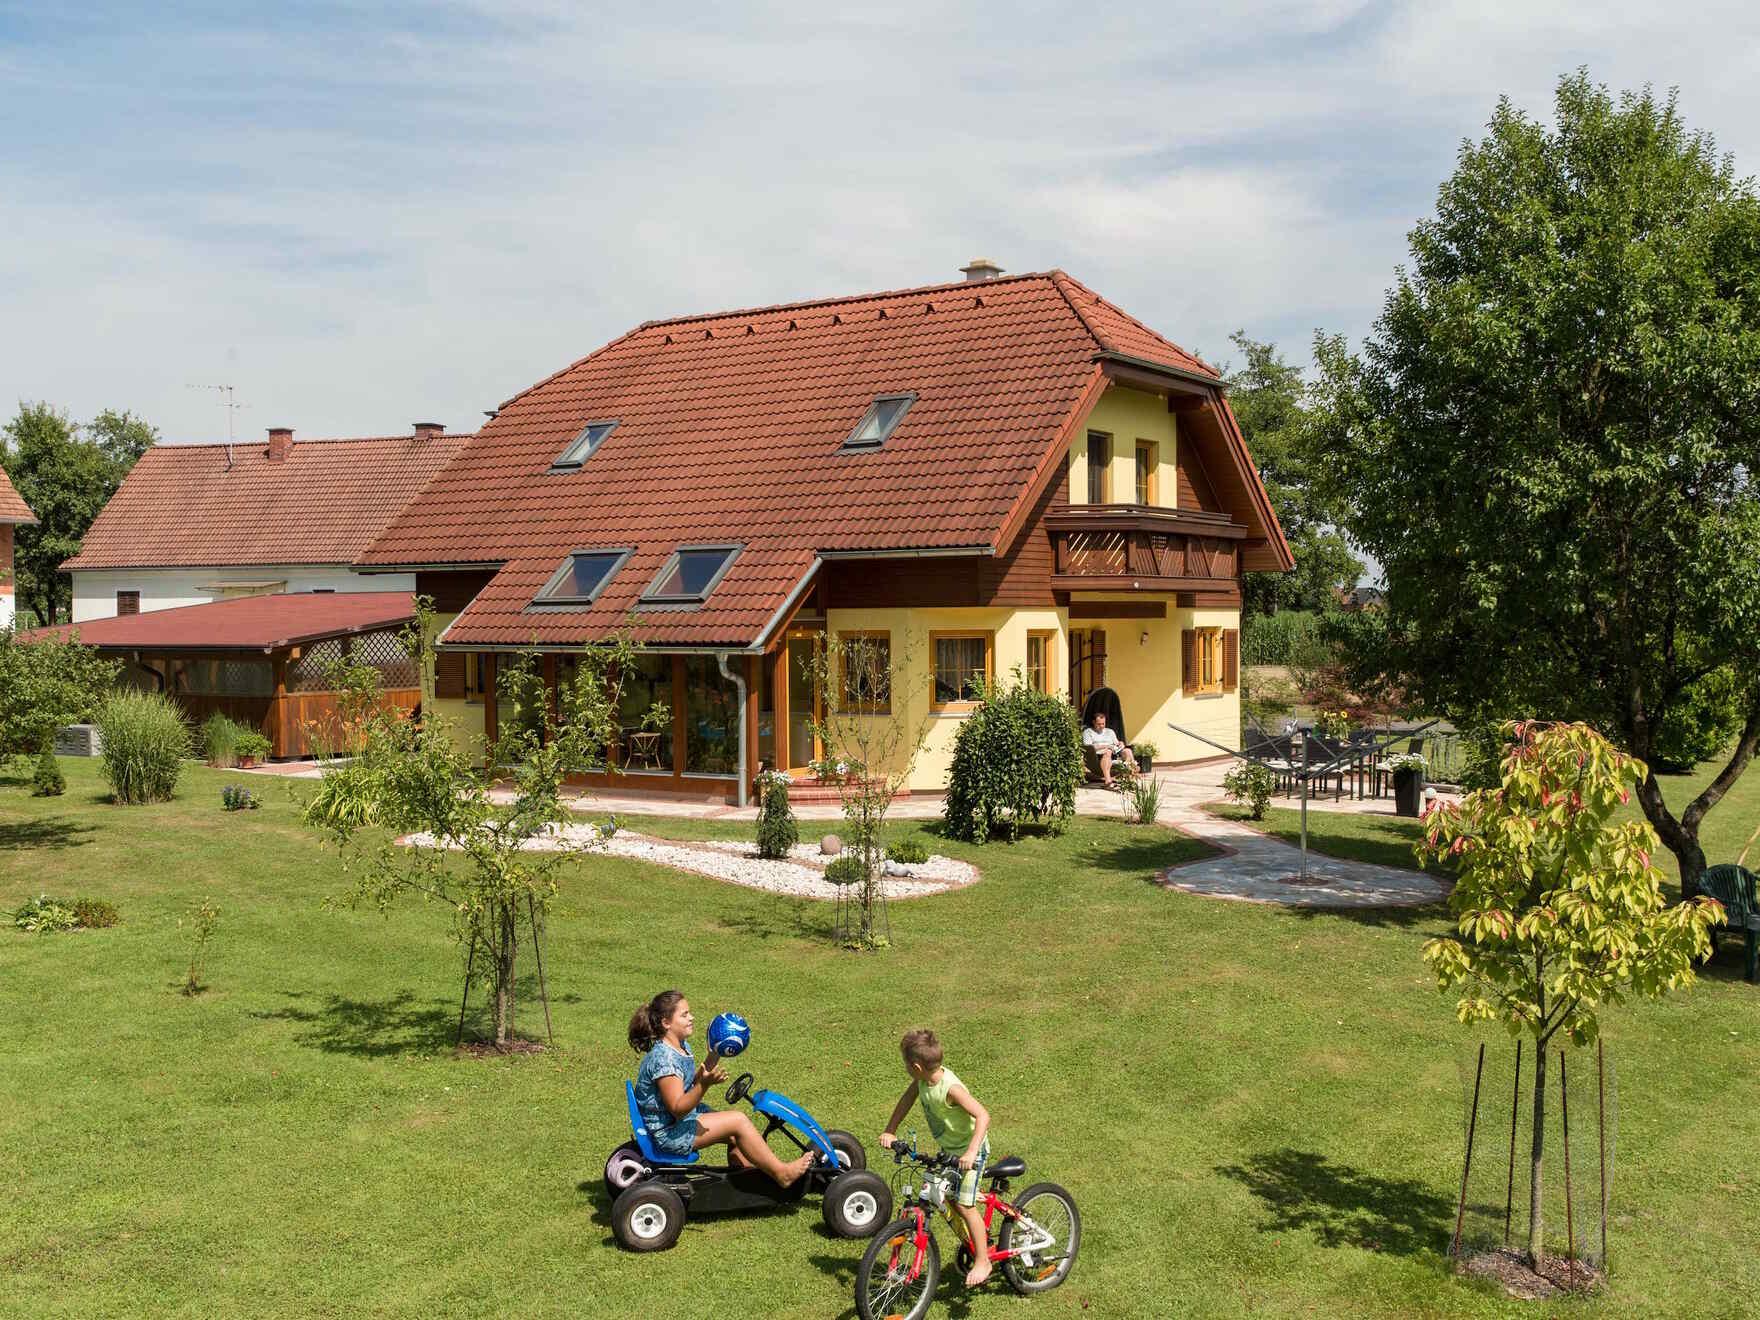 casa prefabbricata in legno Familie Haas